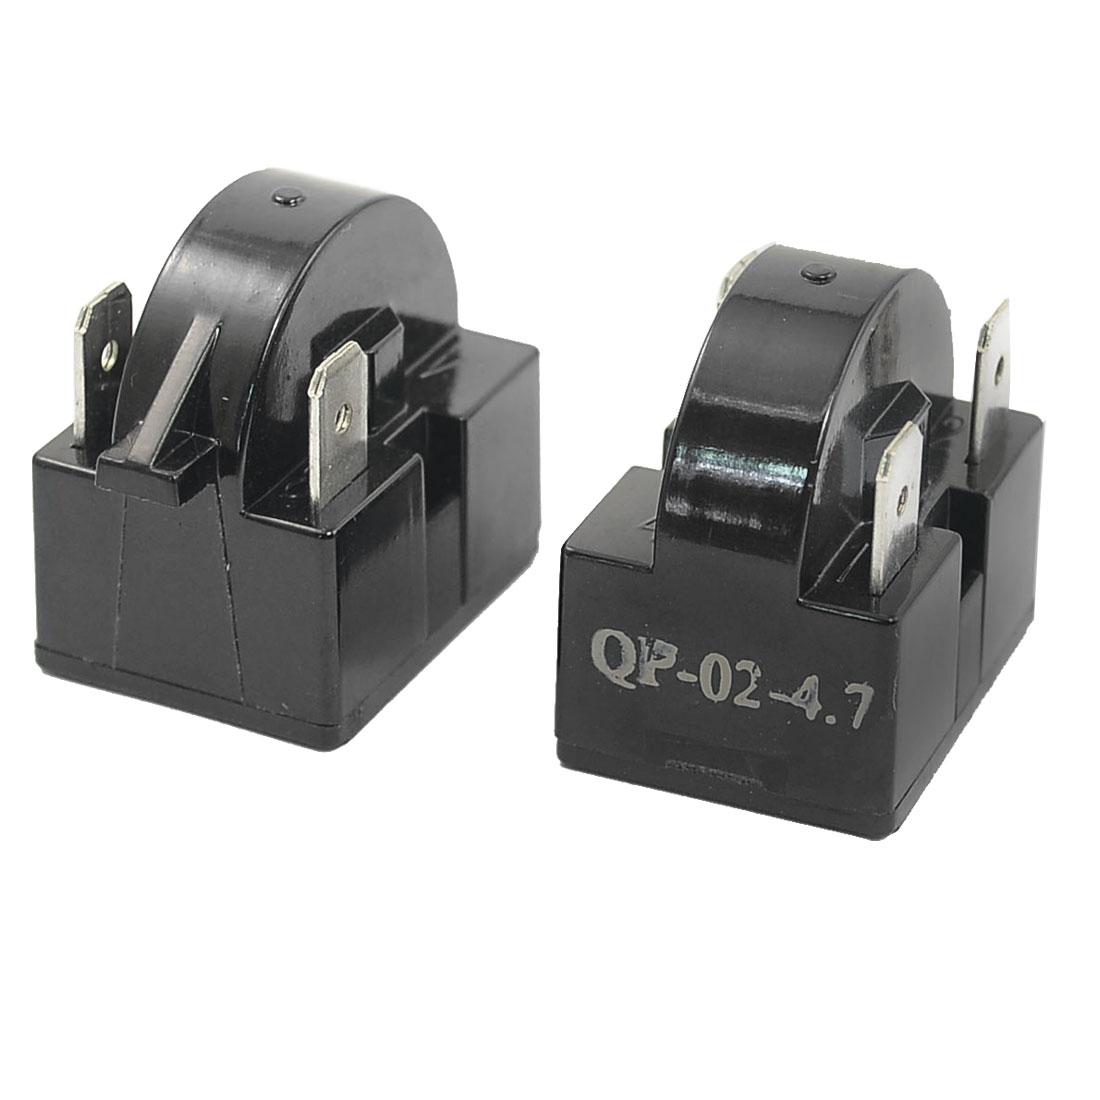 Plastic Housing 4.7 Ohm 3 Pins Refrigerator PTC Starter Relay Black 2PCS